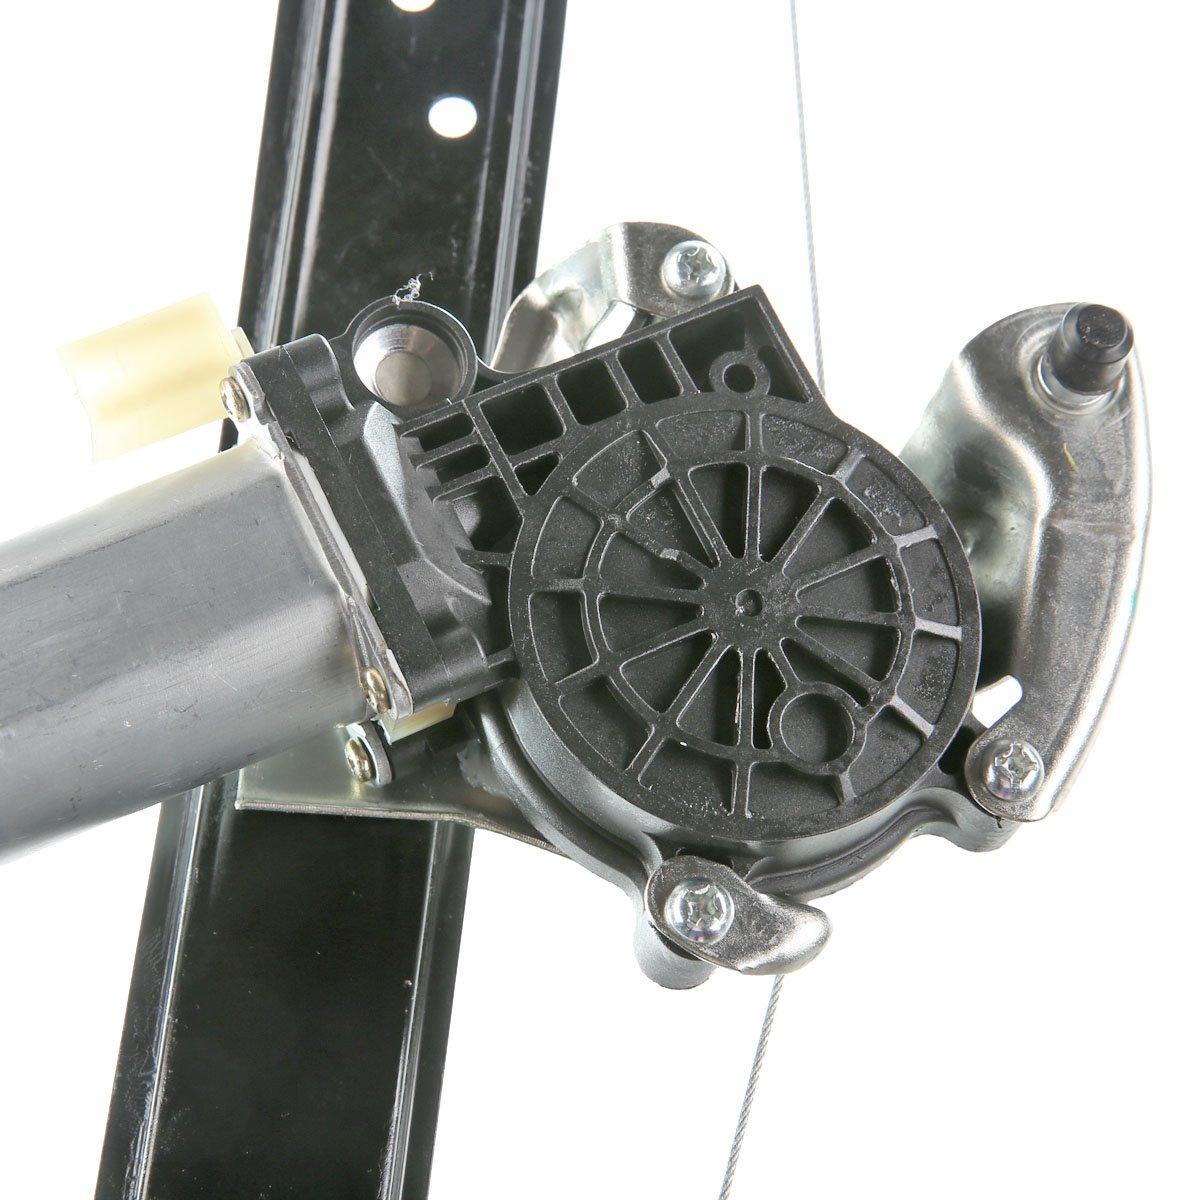 Fensterheber Mit Motor Hinten Rechts f/ür X5 E53 2000-2006 51357125060